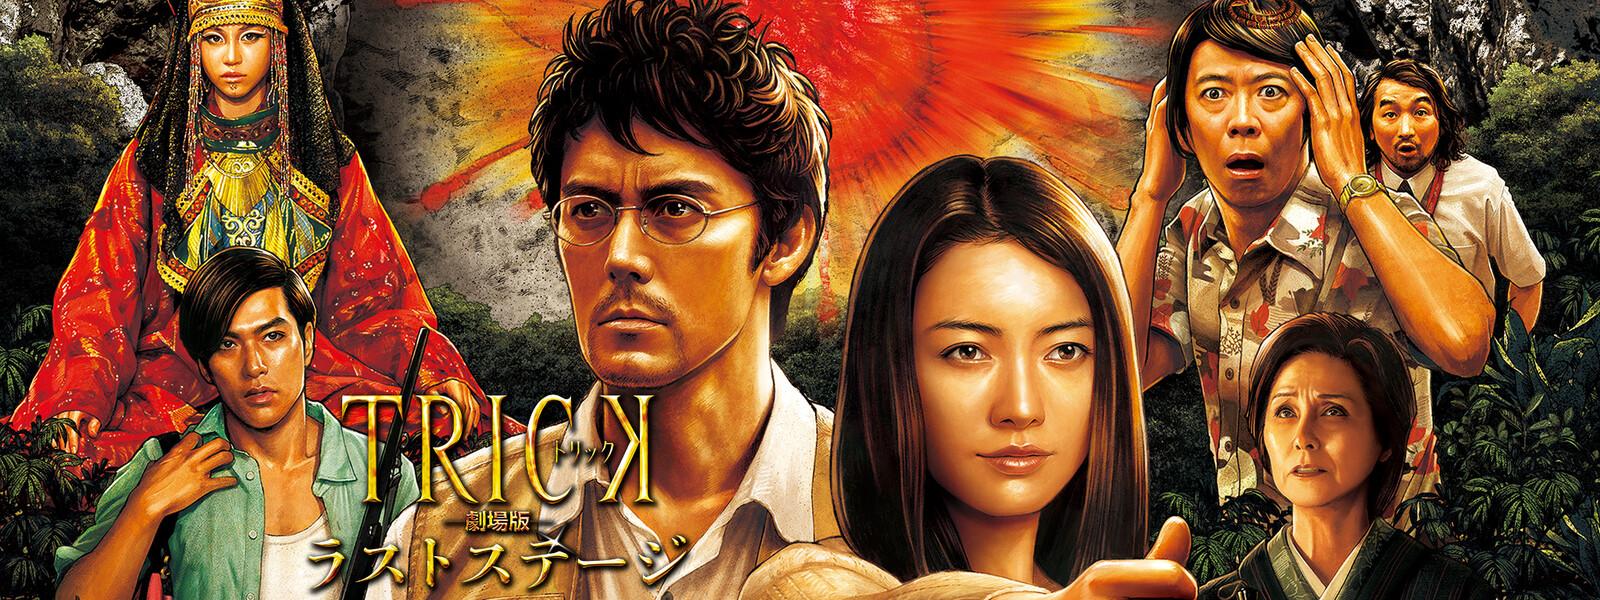 50028228 series art  768x2048 trick the movie last stage 3cb53f73a3d7523d9effad447303a14b - 野際陽子さん出演作品を自宅で見る事ができます。